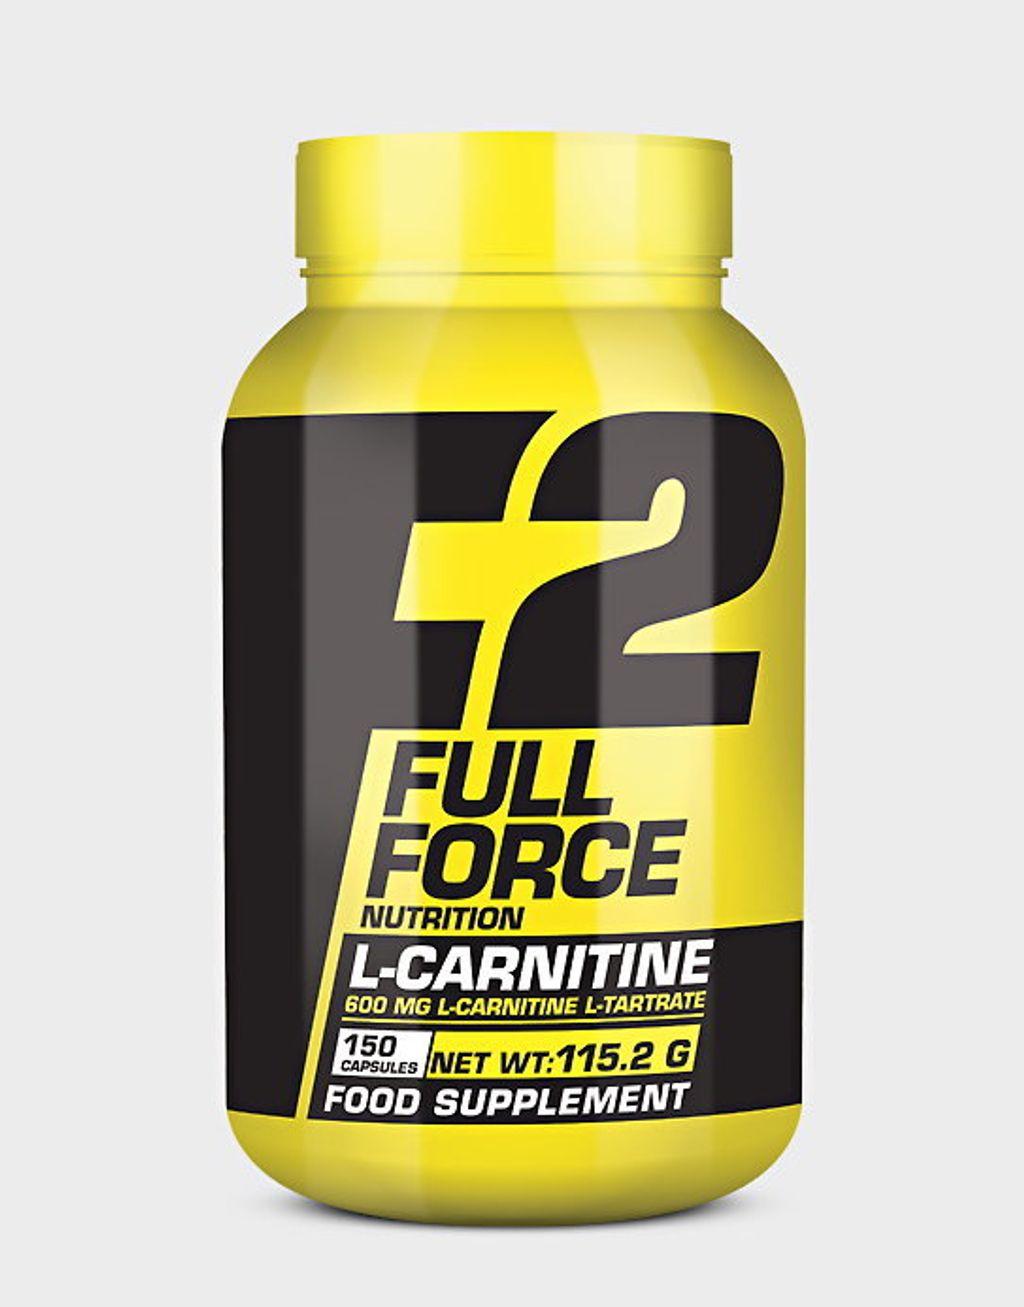 f2 full force l-carnitine malaysia.jpg